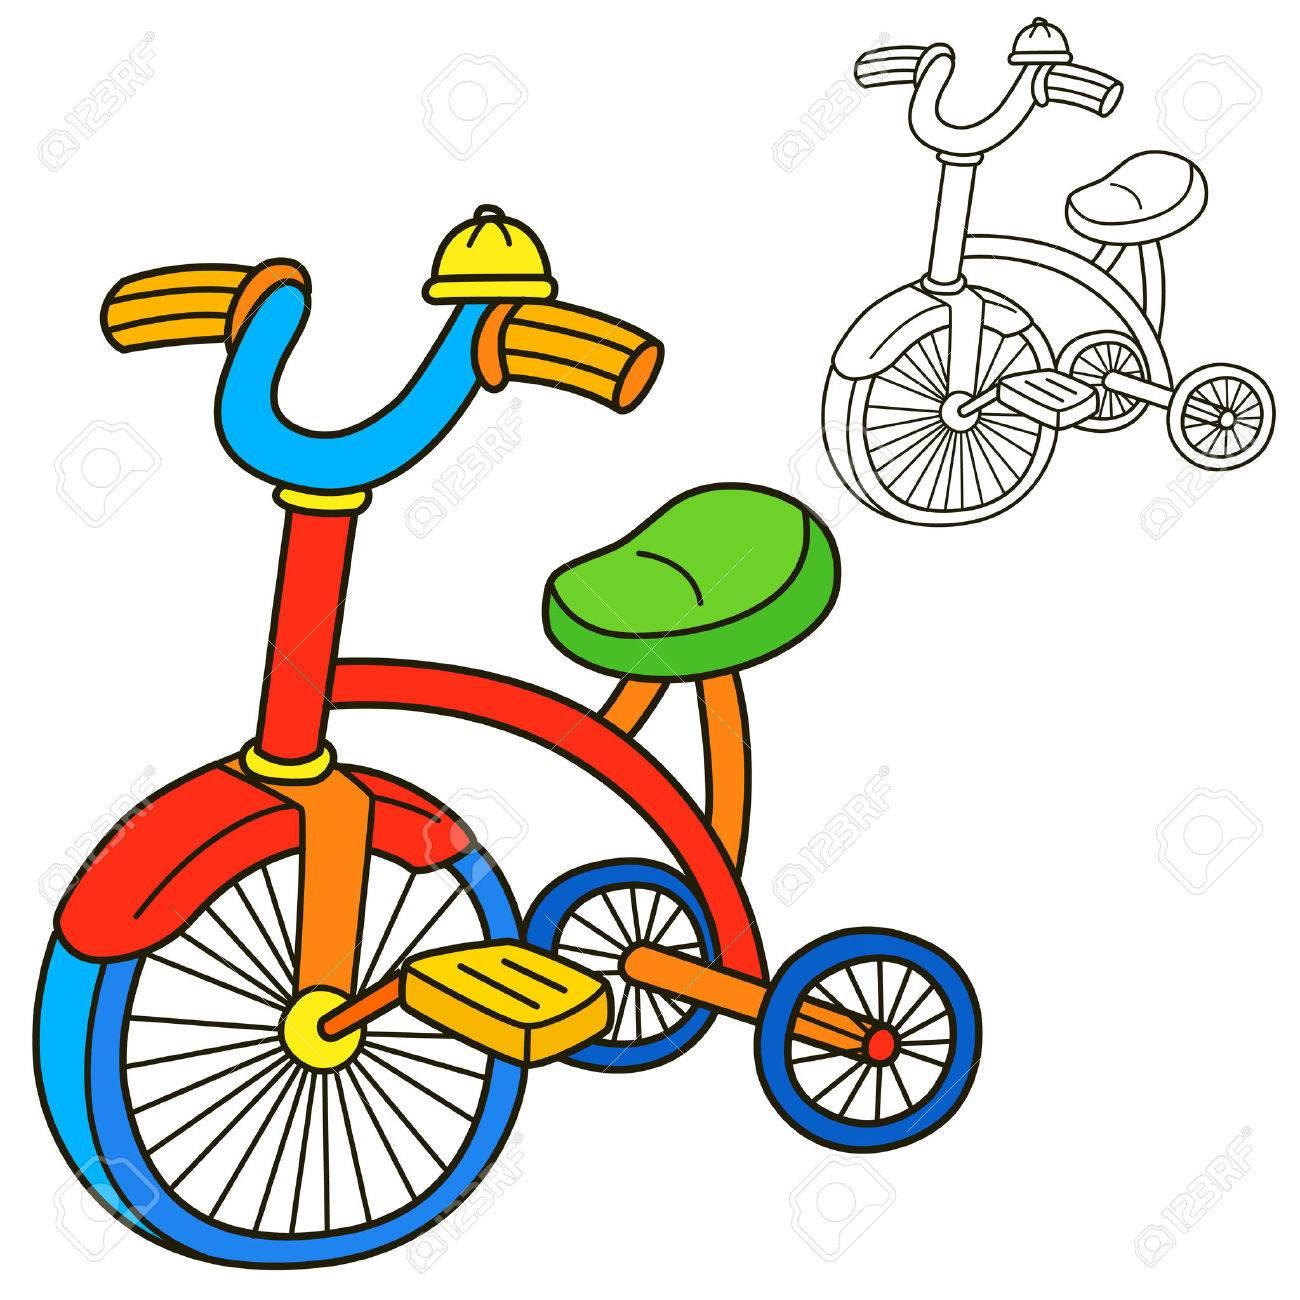 bicycle coloring book page cartoon vector illustration stock vector 44675479 - Bicycle Coloring Book